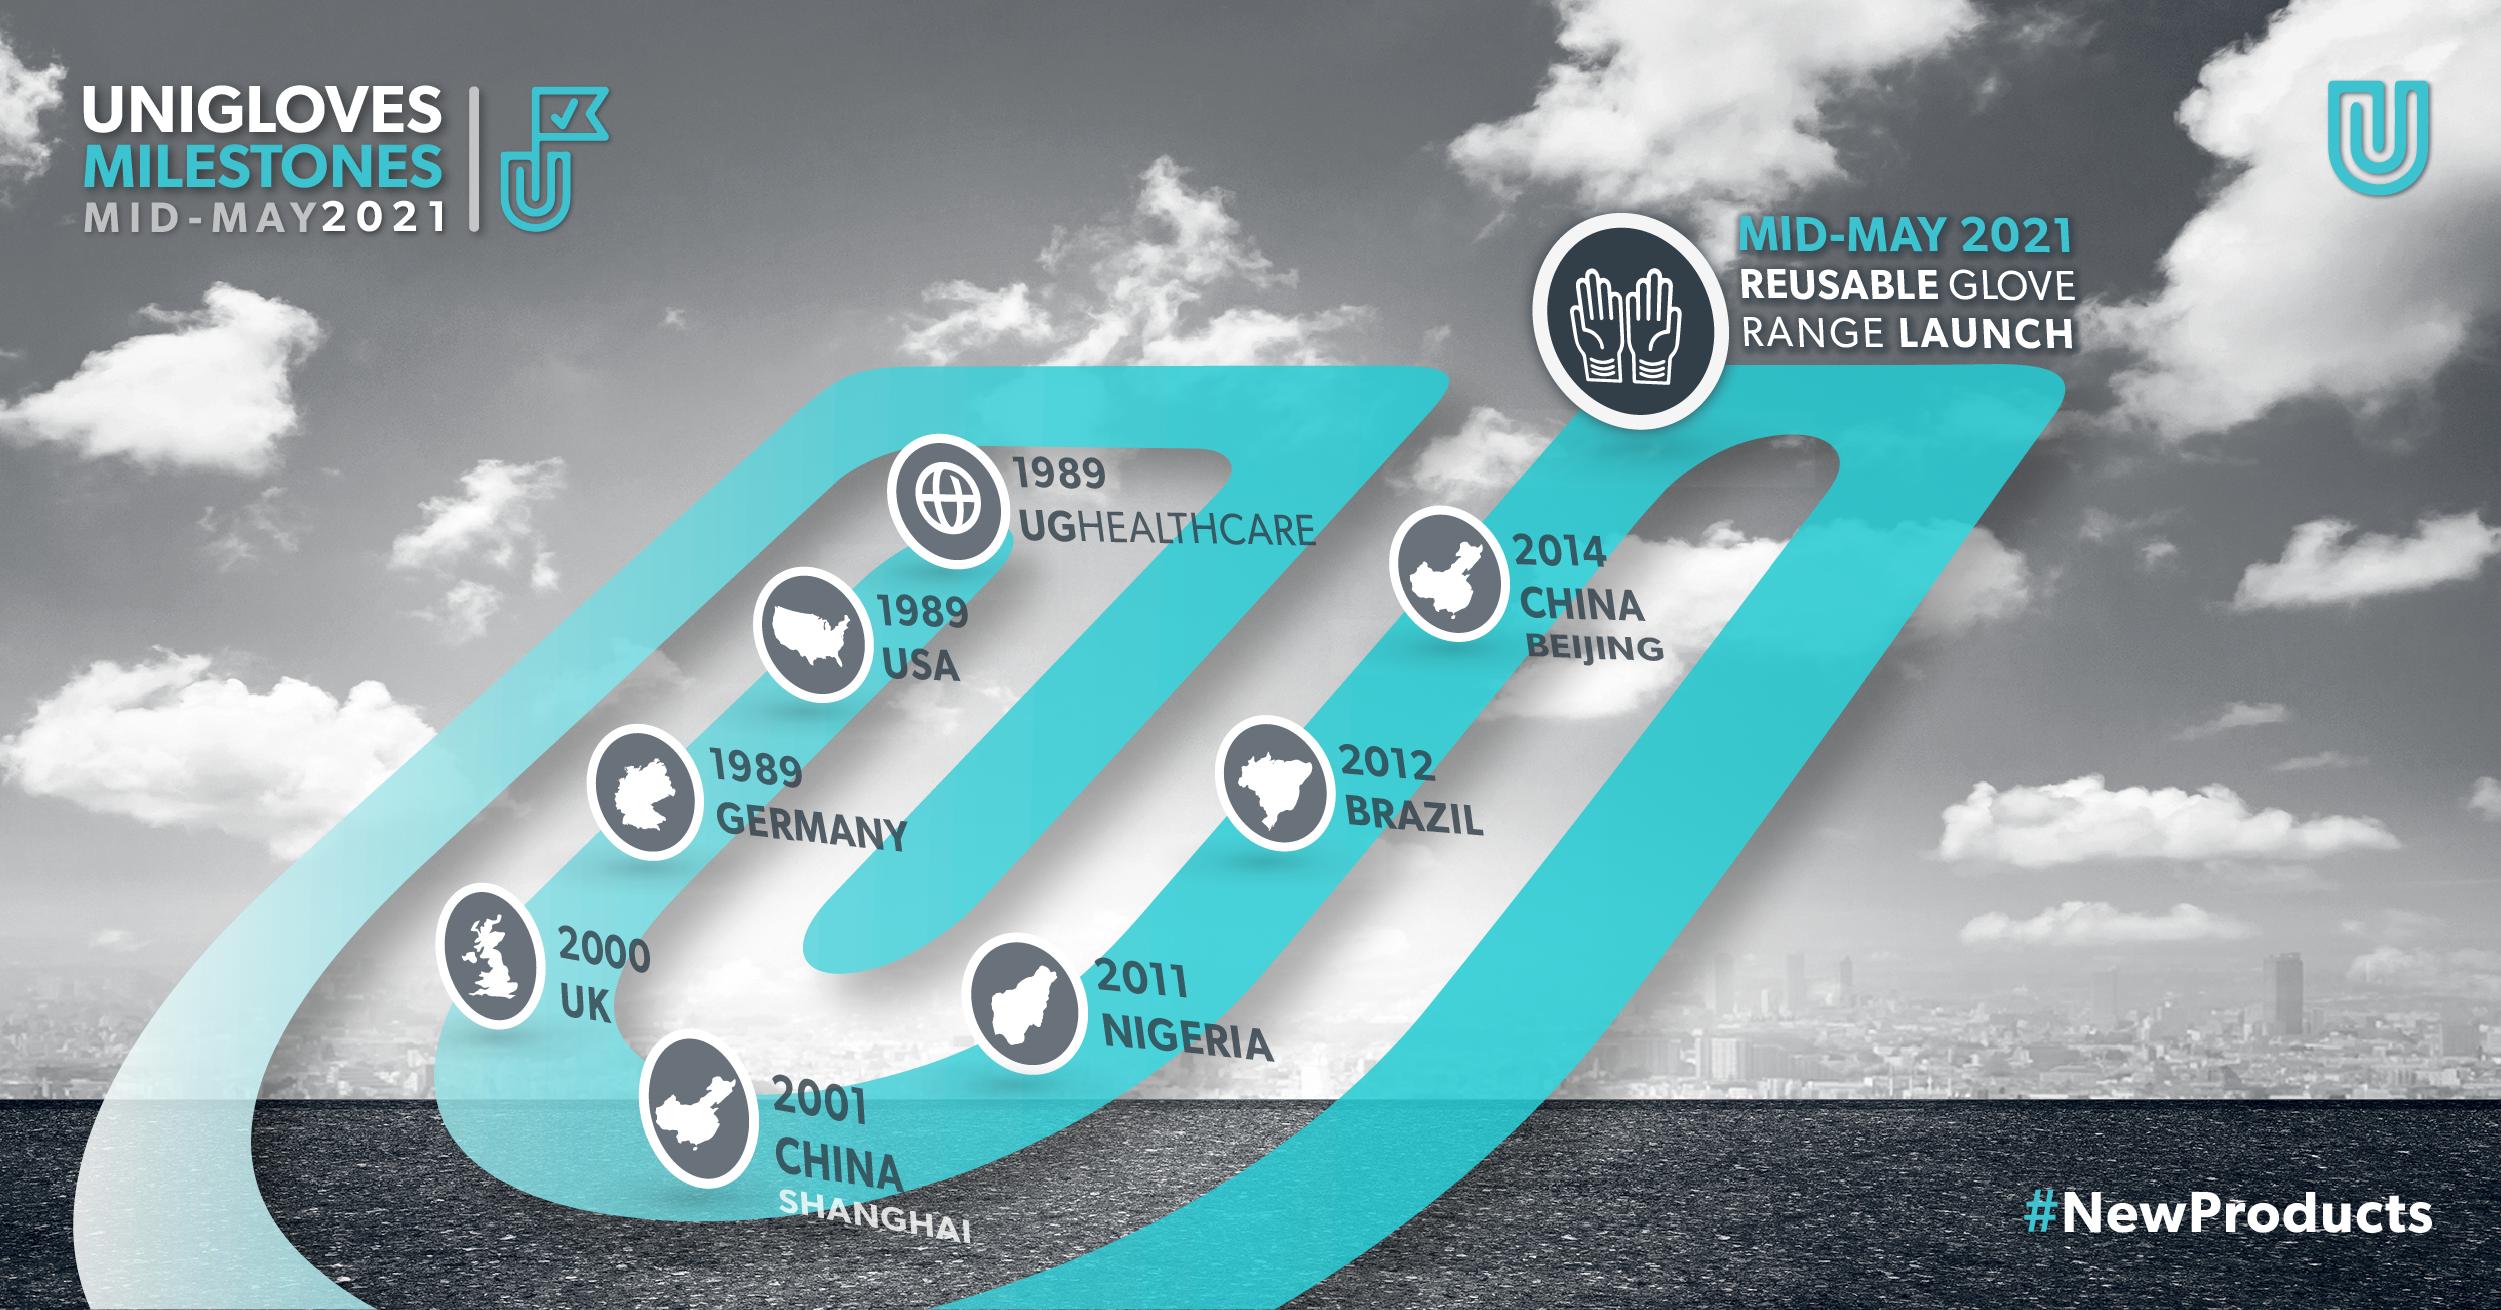 Milestones-Linkedin-Unigloves-Reusable-Range